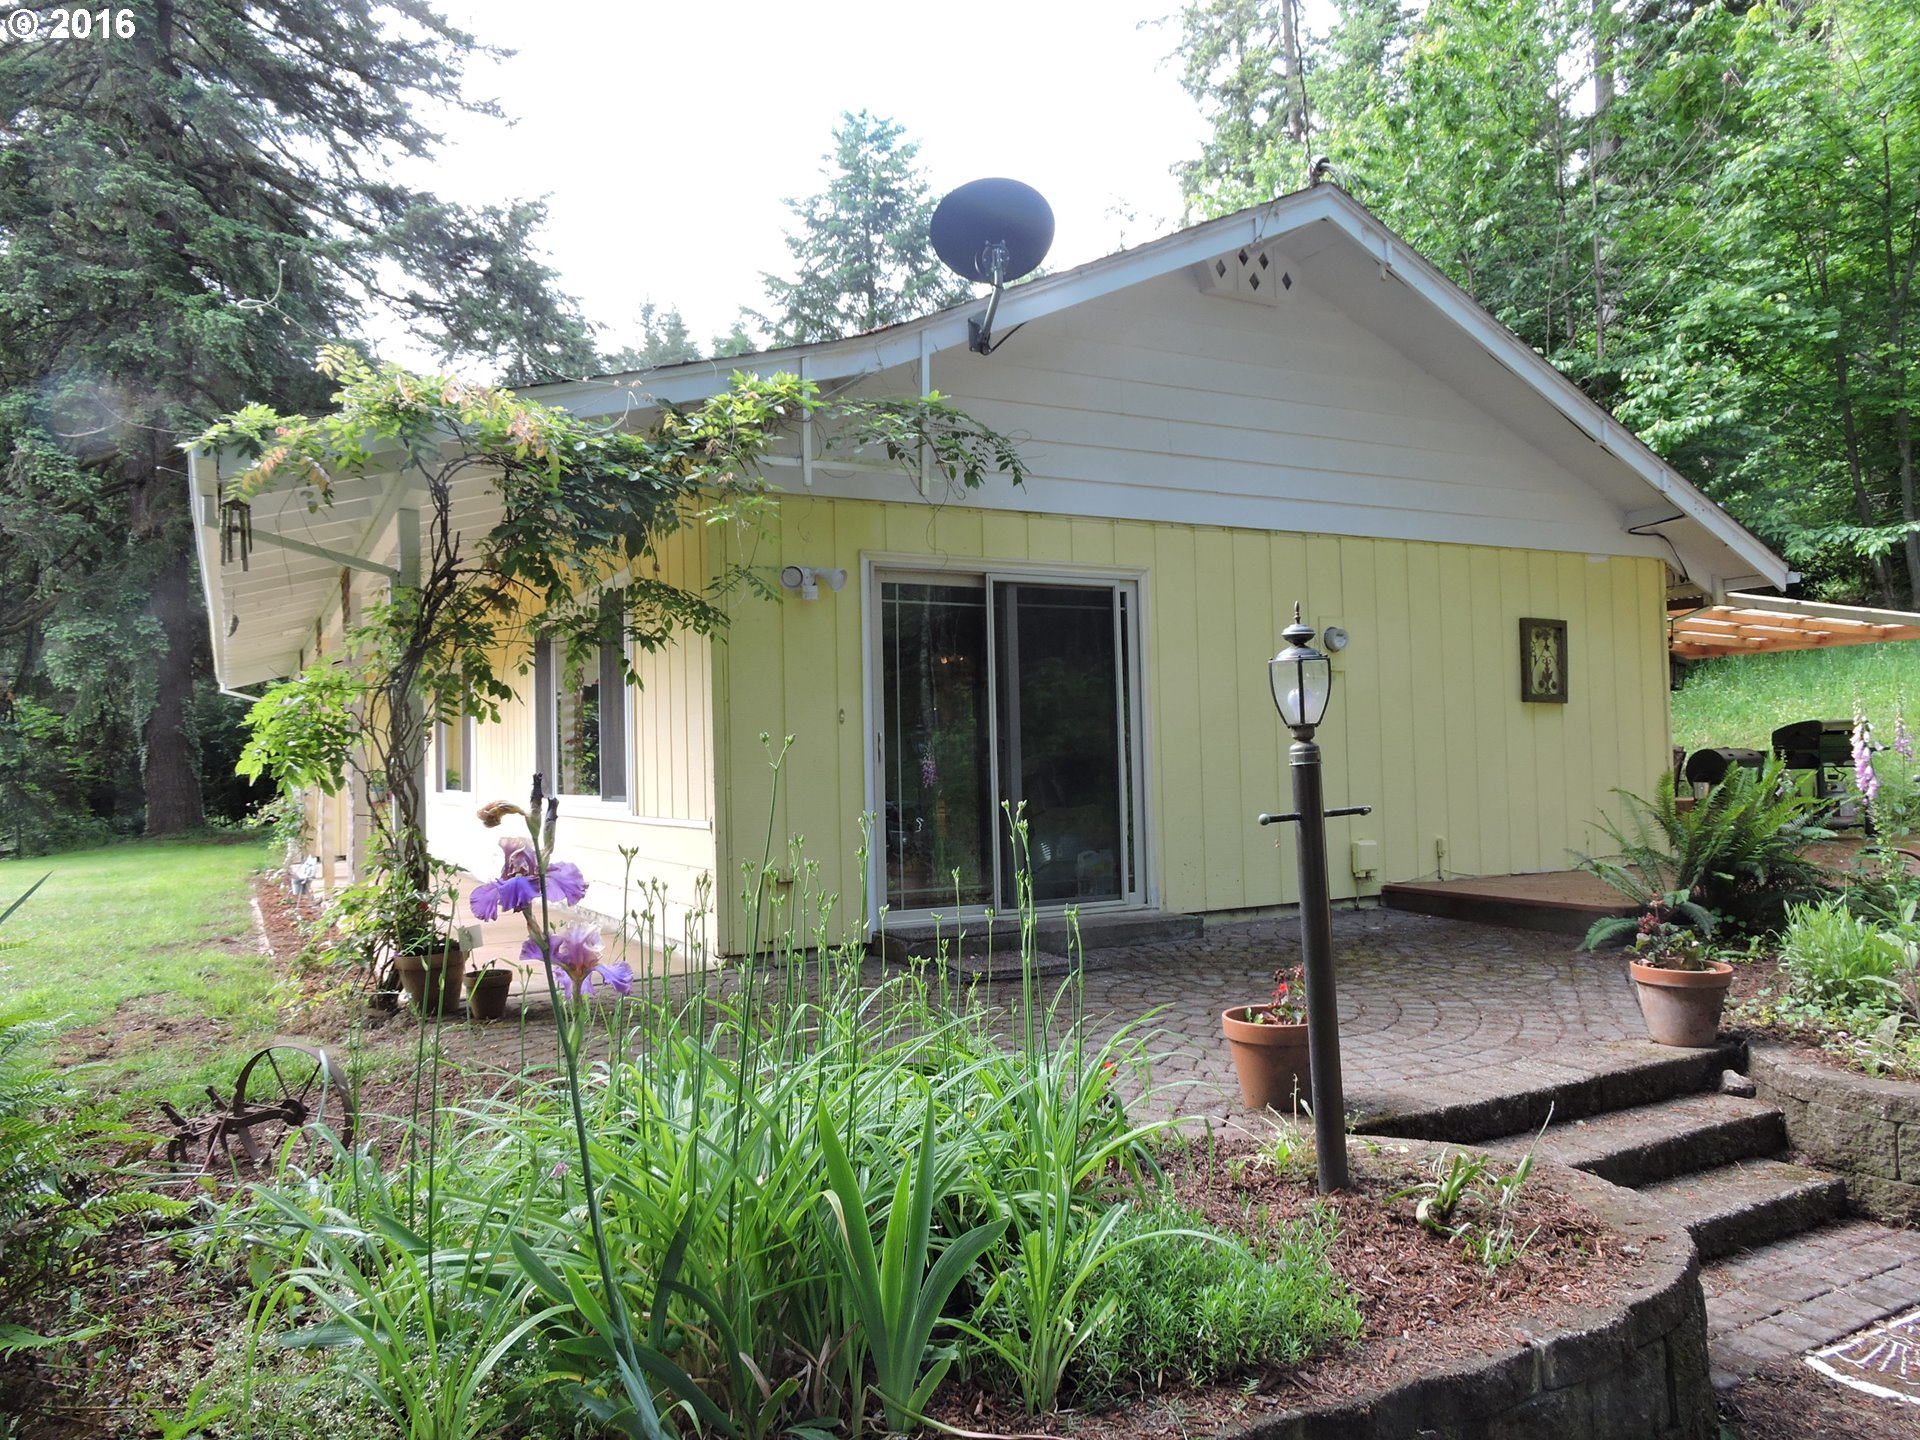 32706 EAGLE WOOD DR, Cottage Grove OR 97424